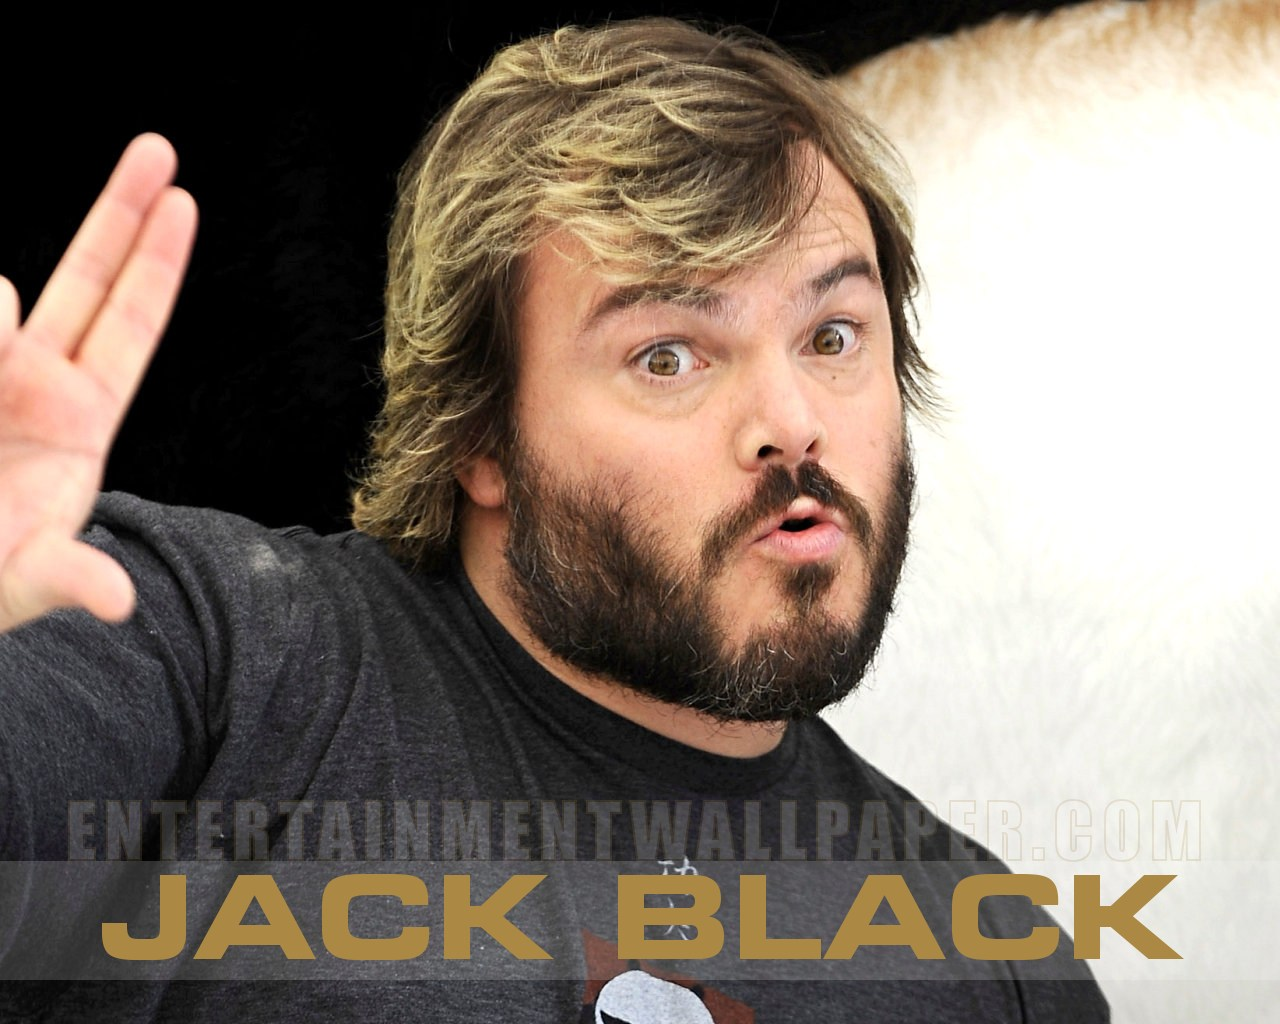 Jack Black Wallpaper - Original size, download now.